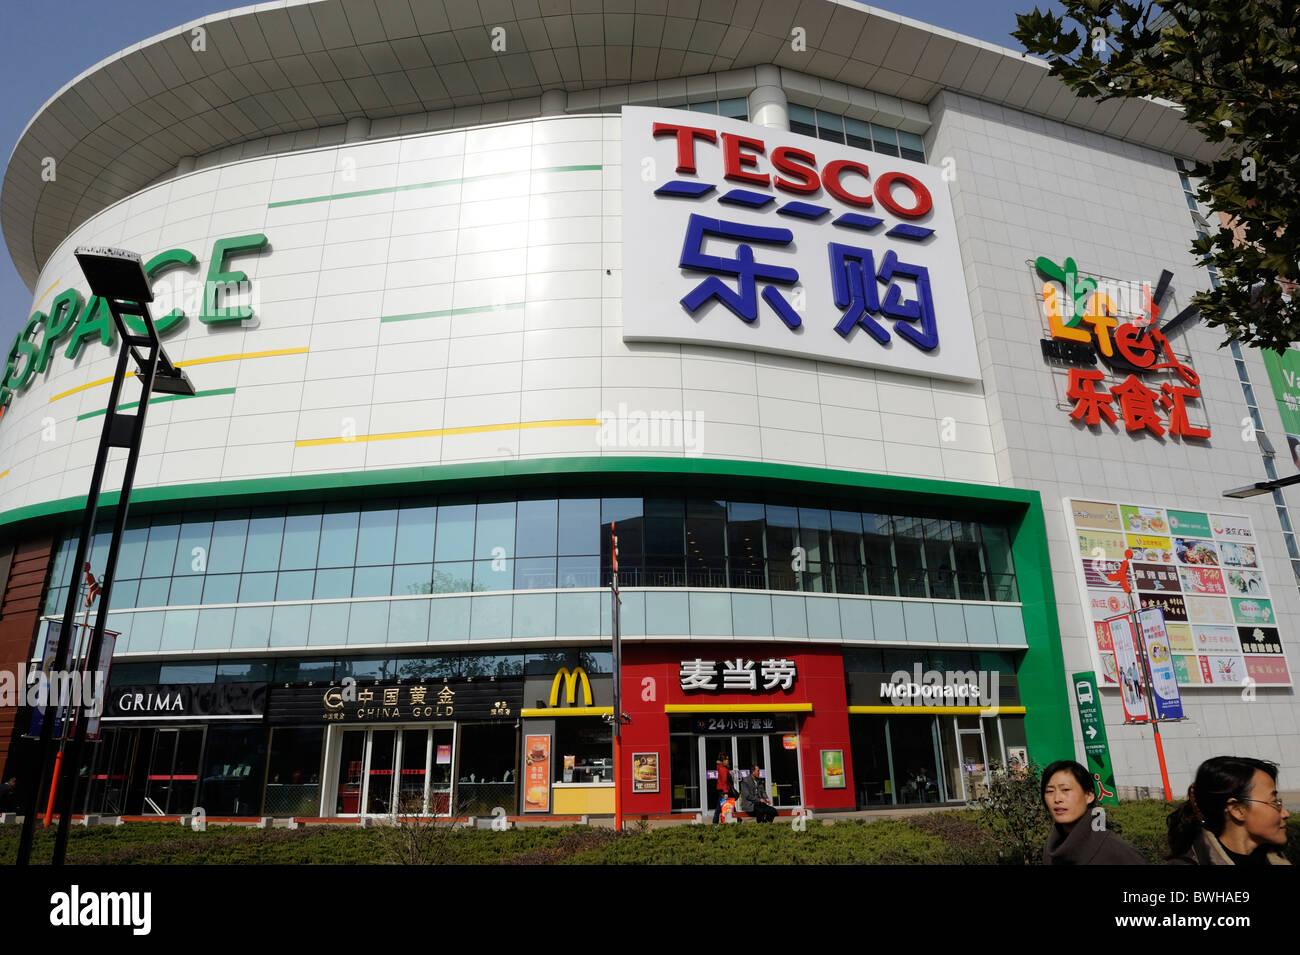 Qingdao Tesco in Qingdao, Shandong province, China.11-Nov-2010 - Stock Image